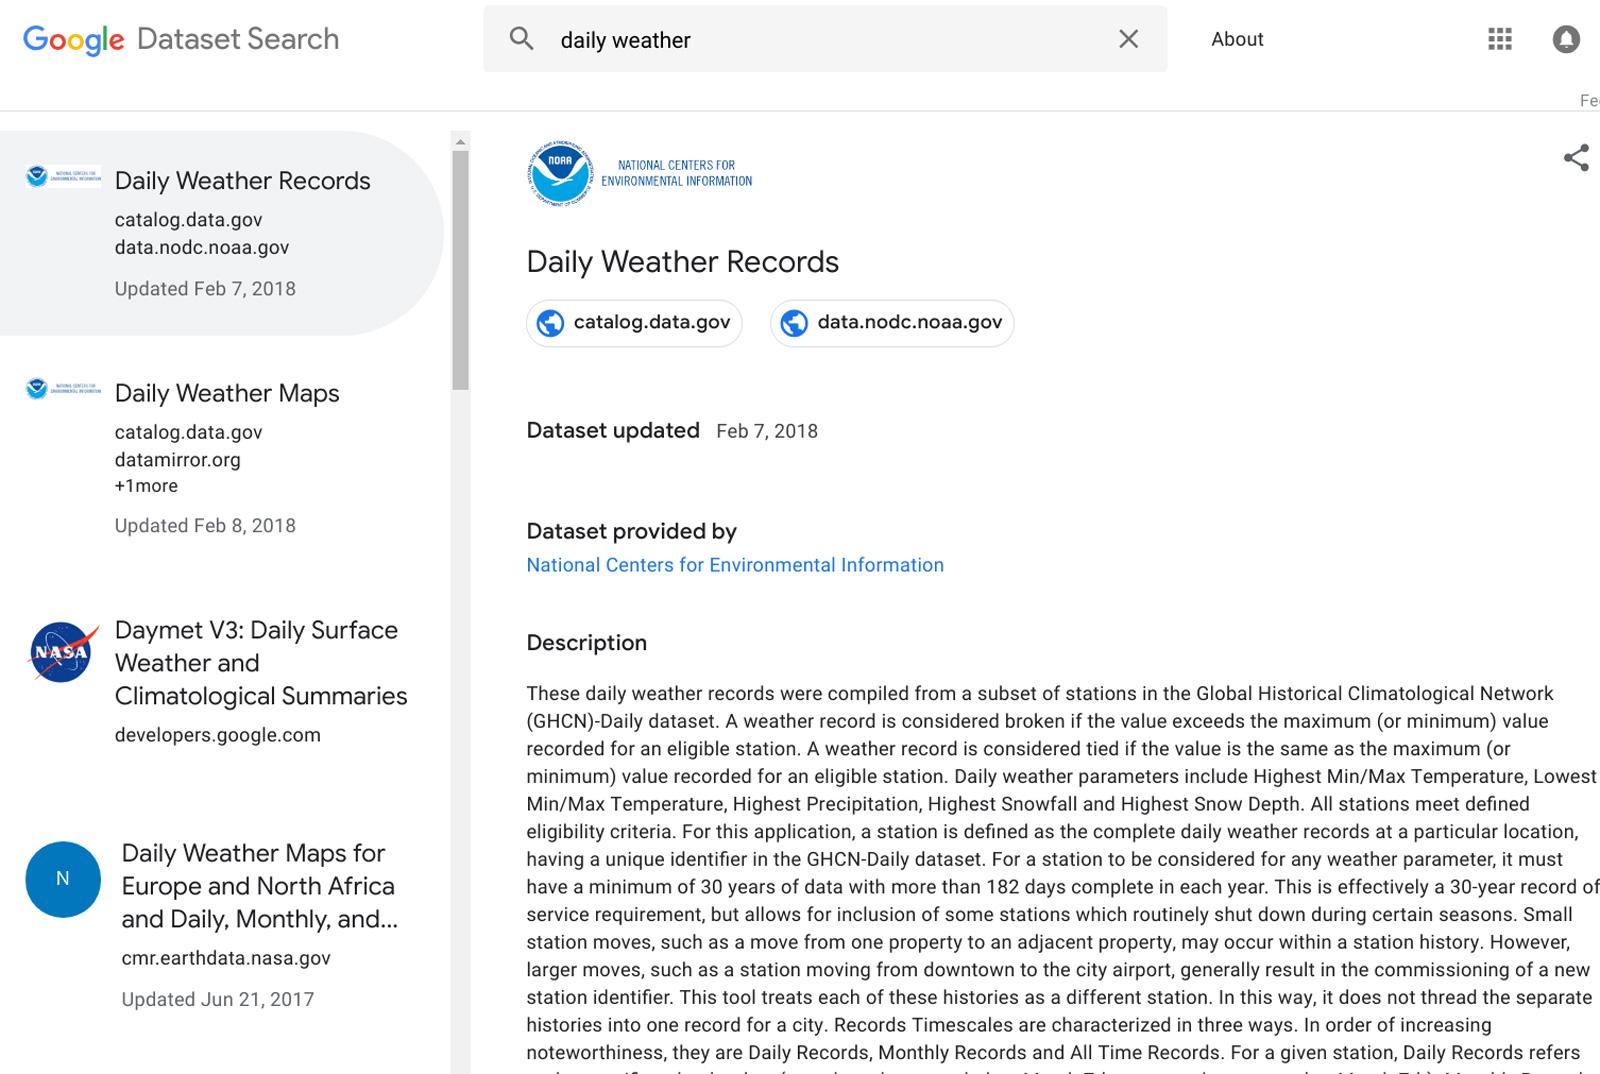 Google Dataset Search